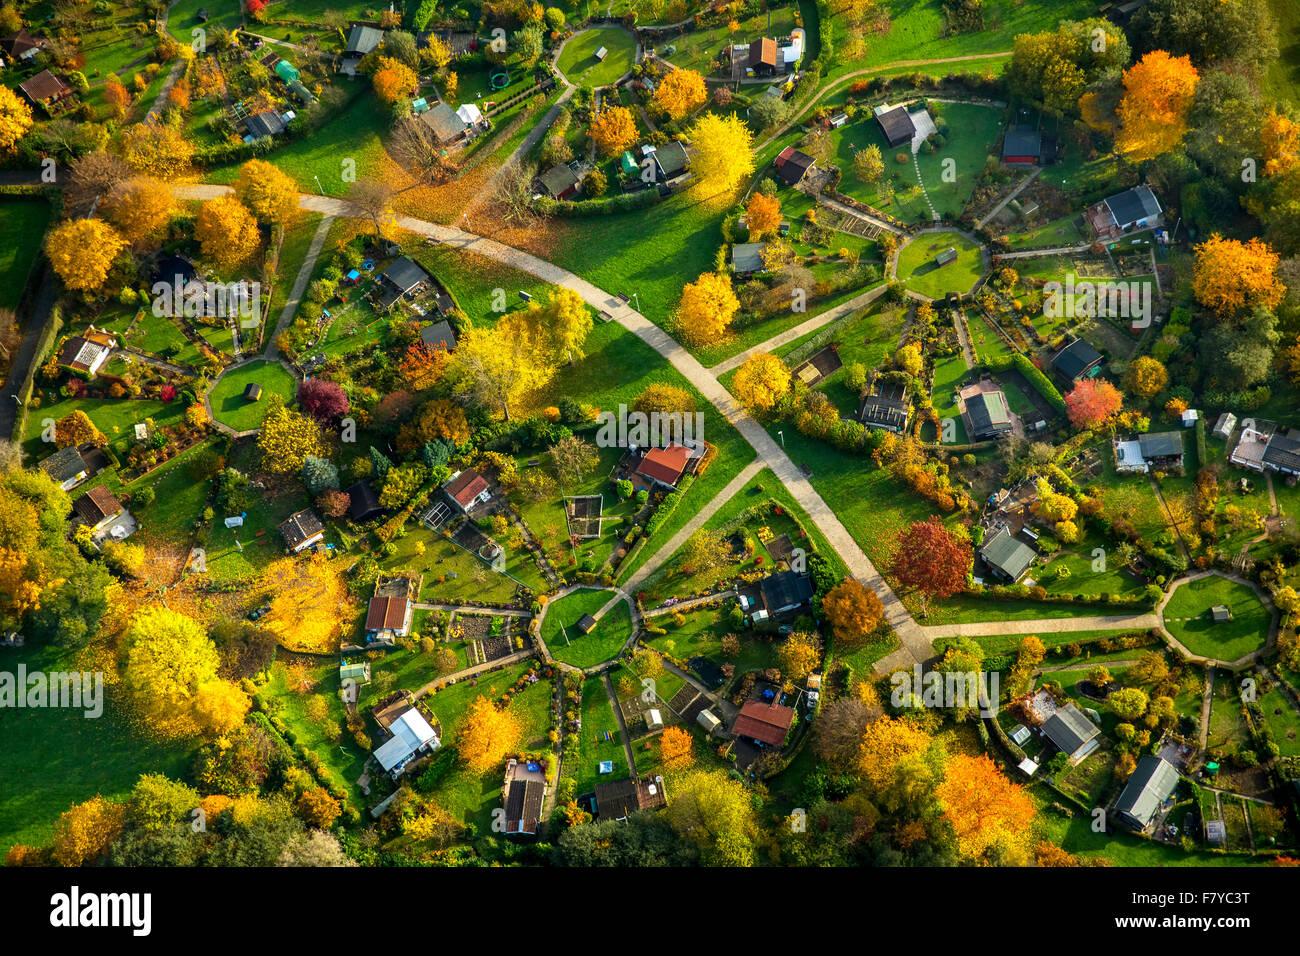 Circular allotment gardens, allotments on Heuweg, circular divisions, autumn, Witten-Stockum, Witten, Ruhr district - Stock Image